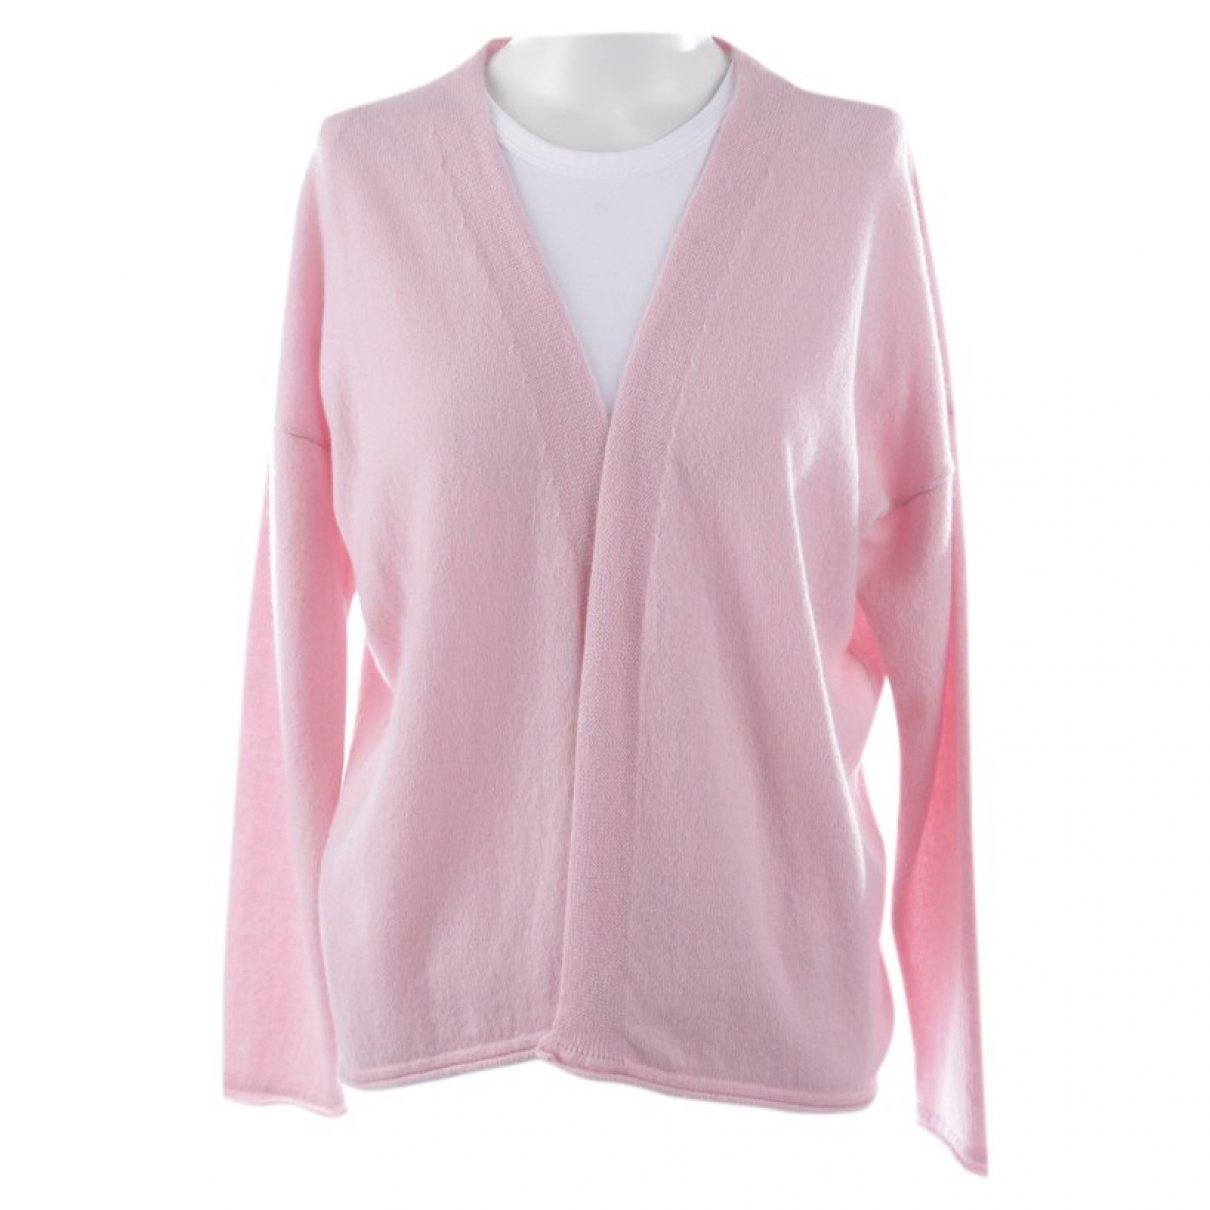 Autre Marque \N Pink Cashmere Knitwear for Women 36 FR